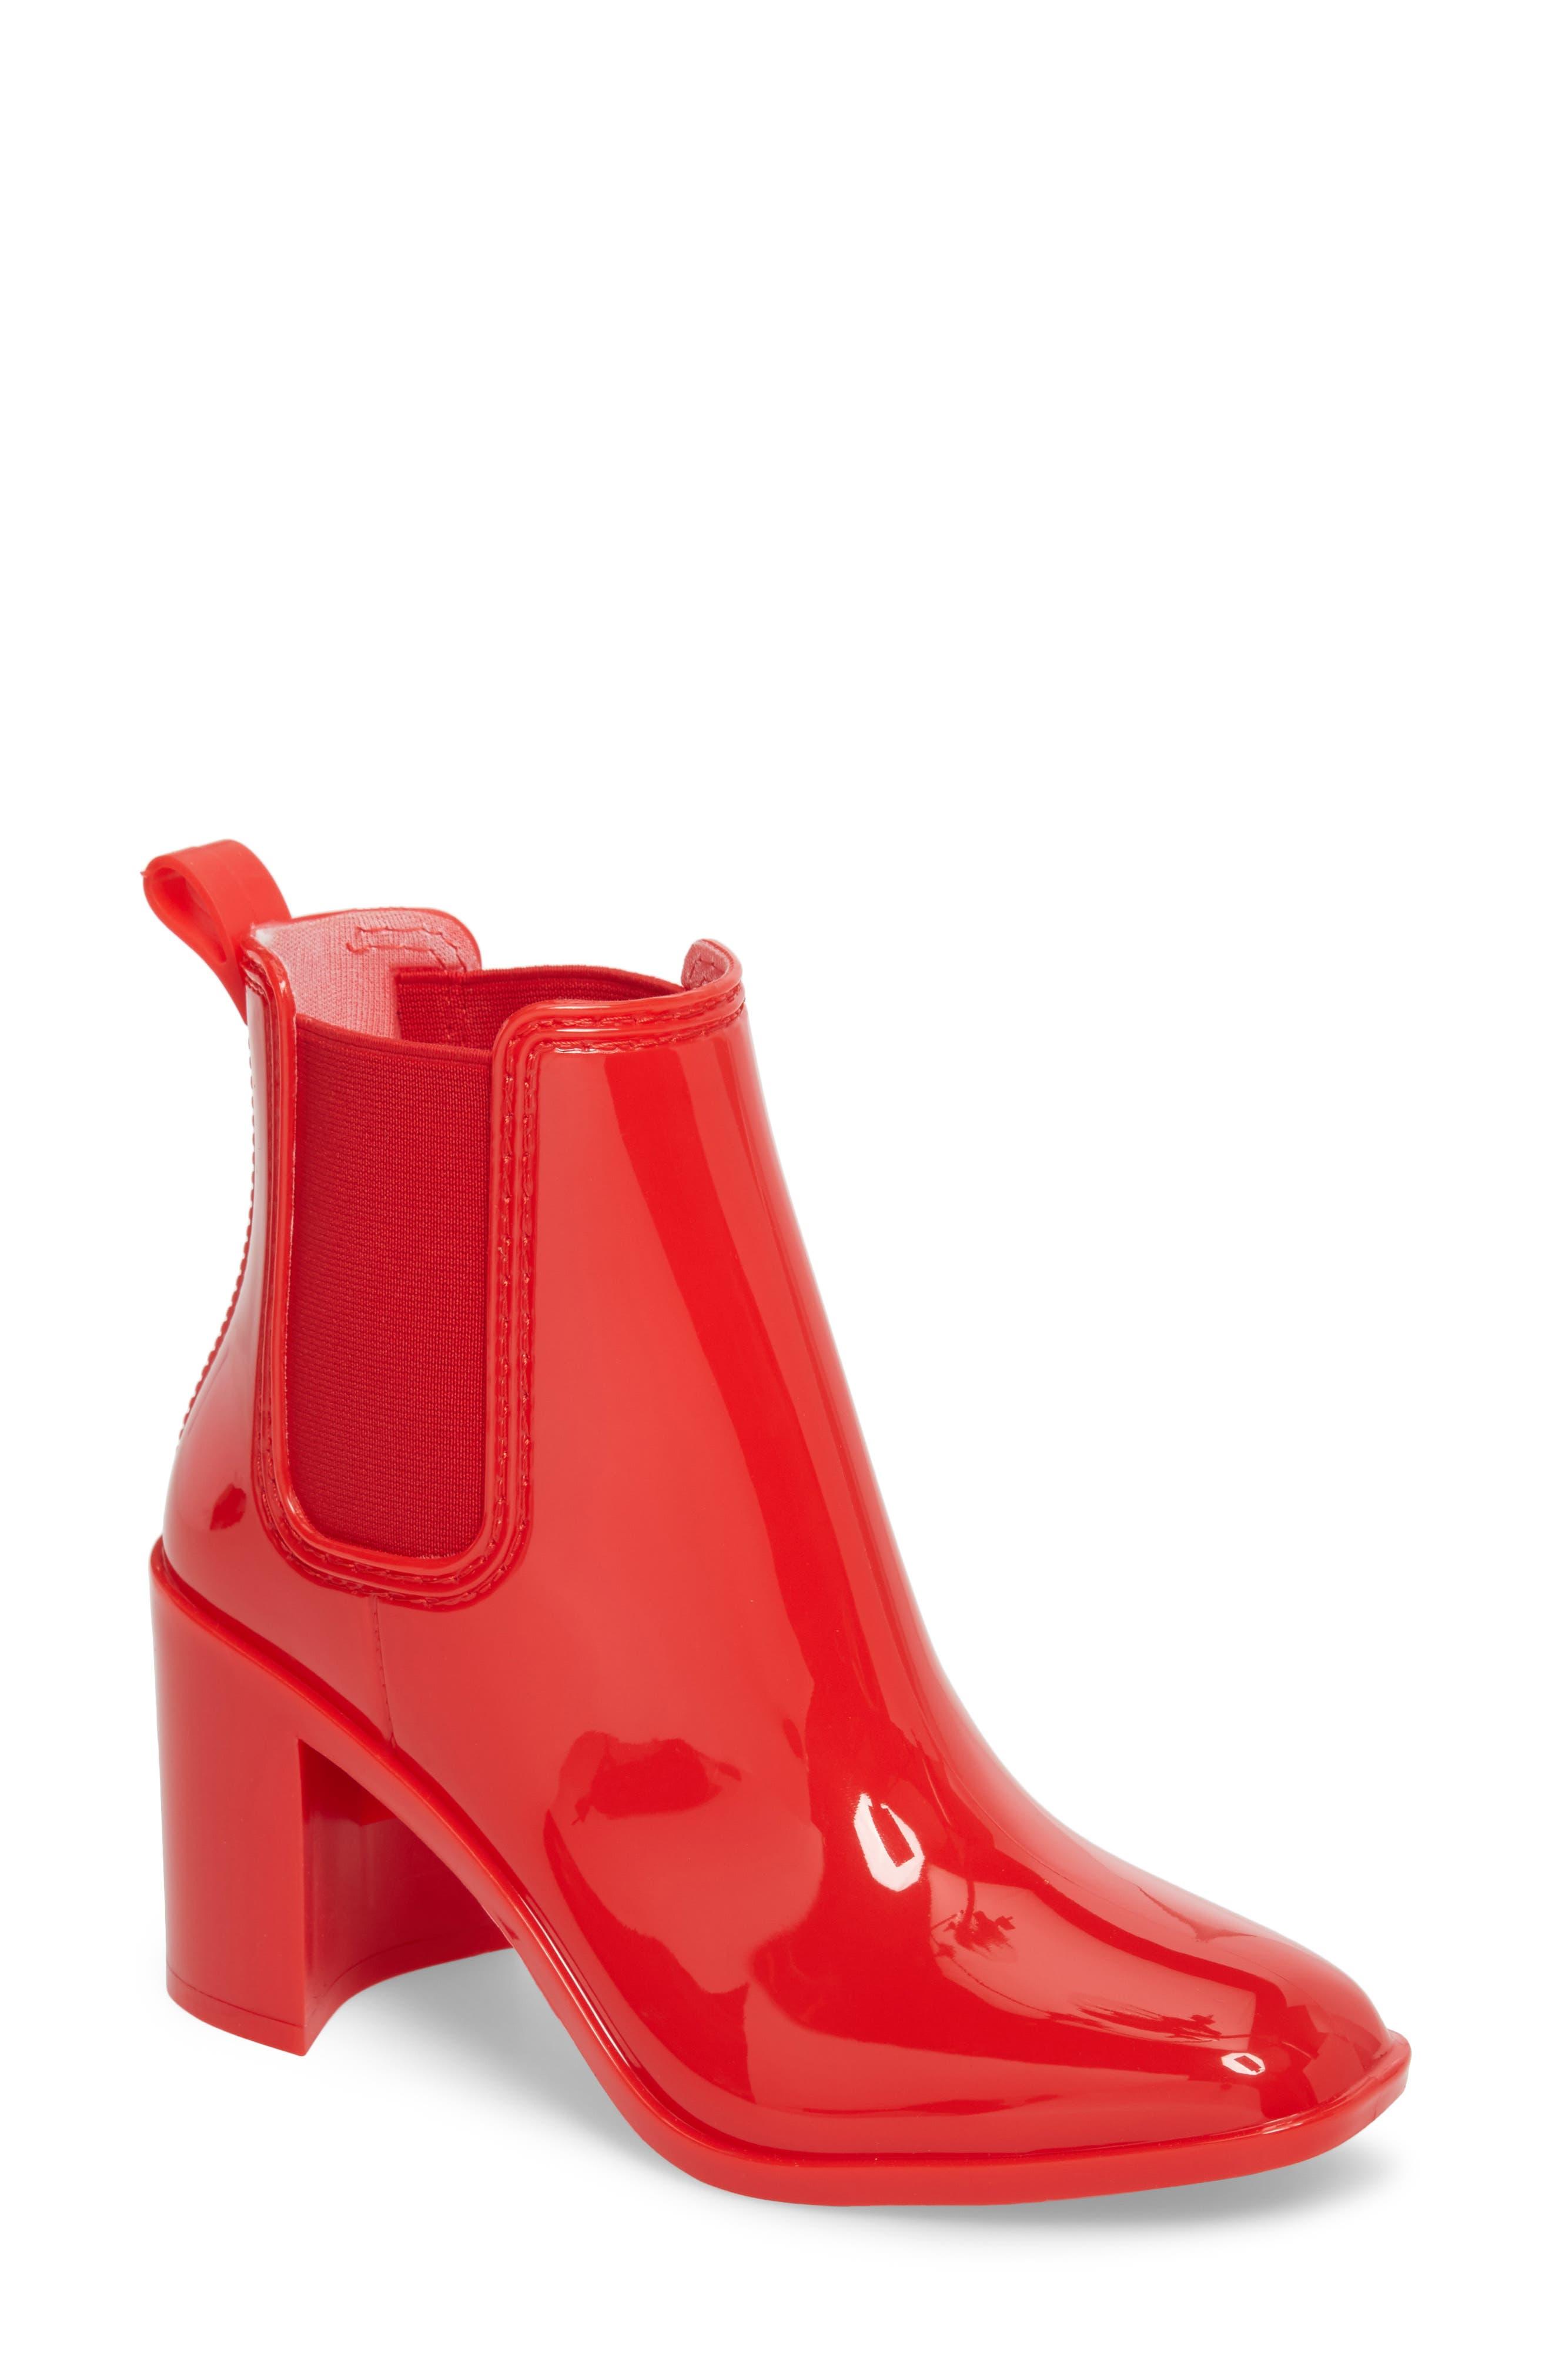 Jeffrey Campbell Hurricane Waterproof Boot, Red